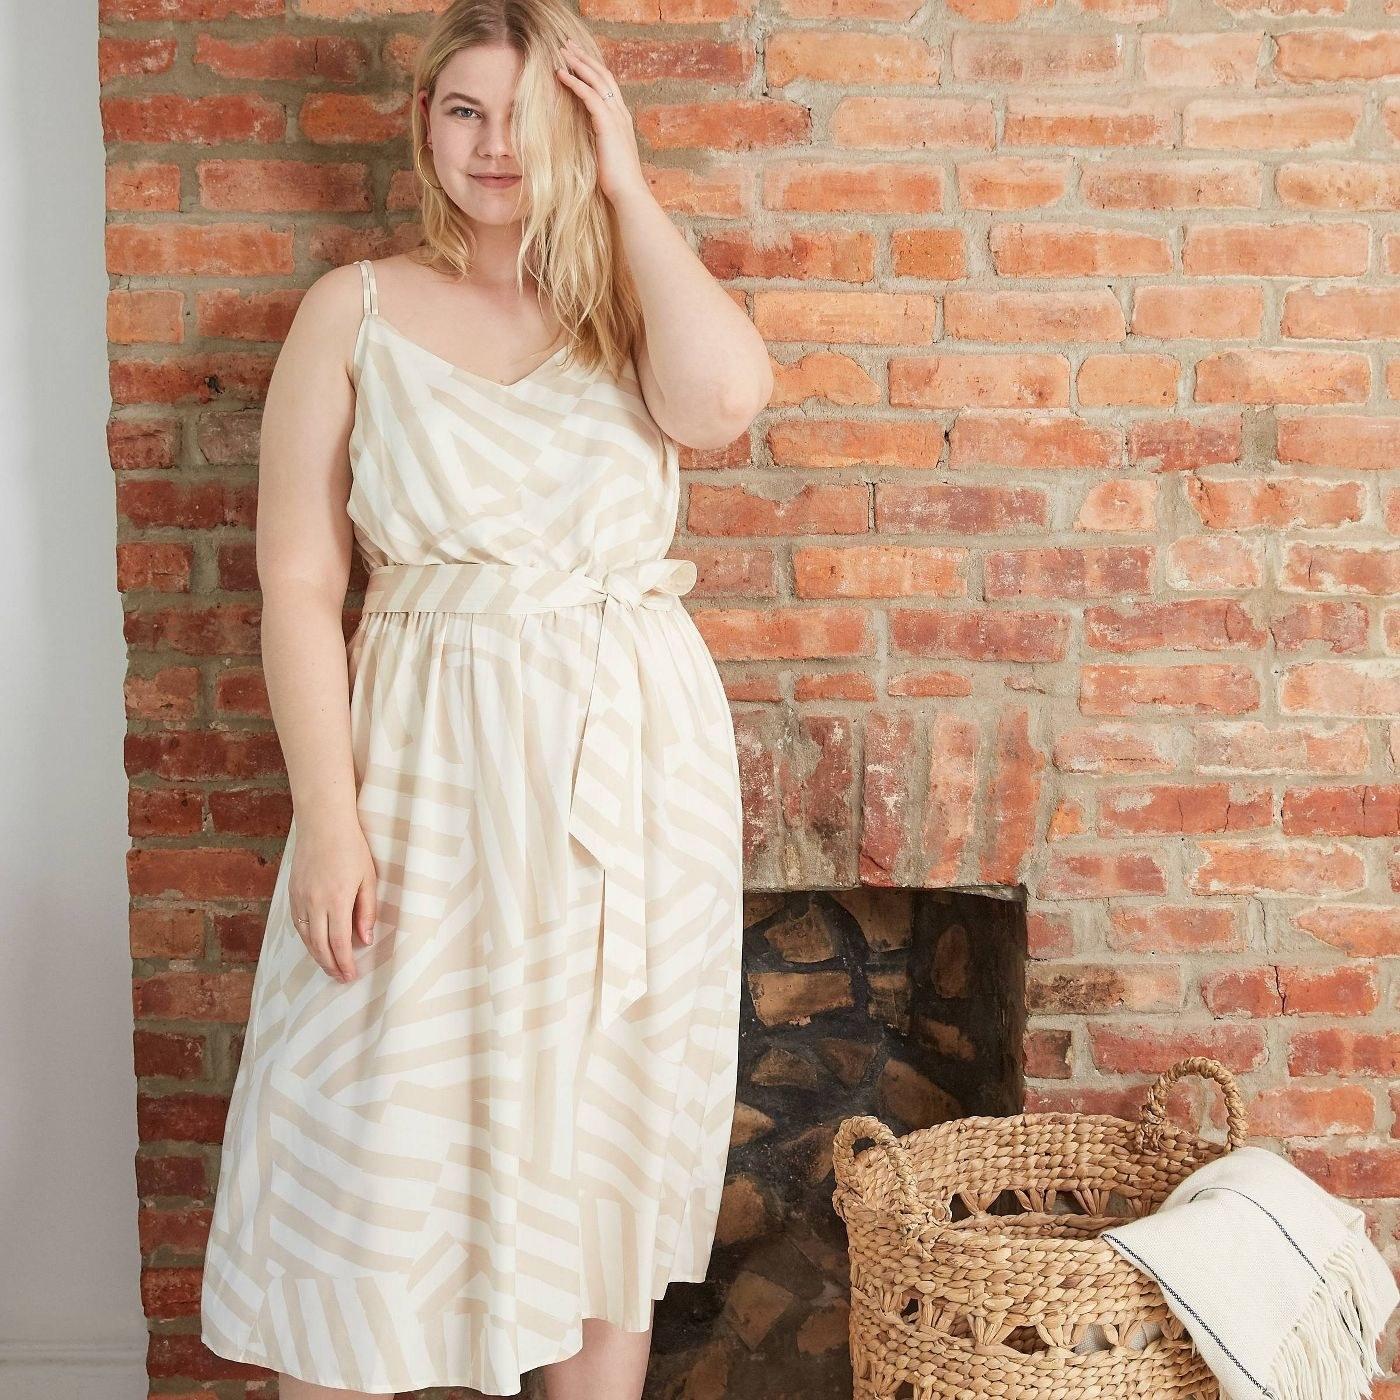 model wearing cream striped dress with tie waist